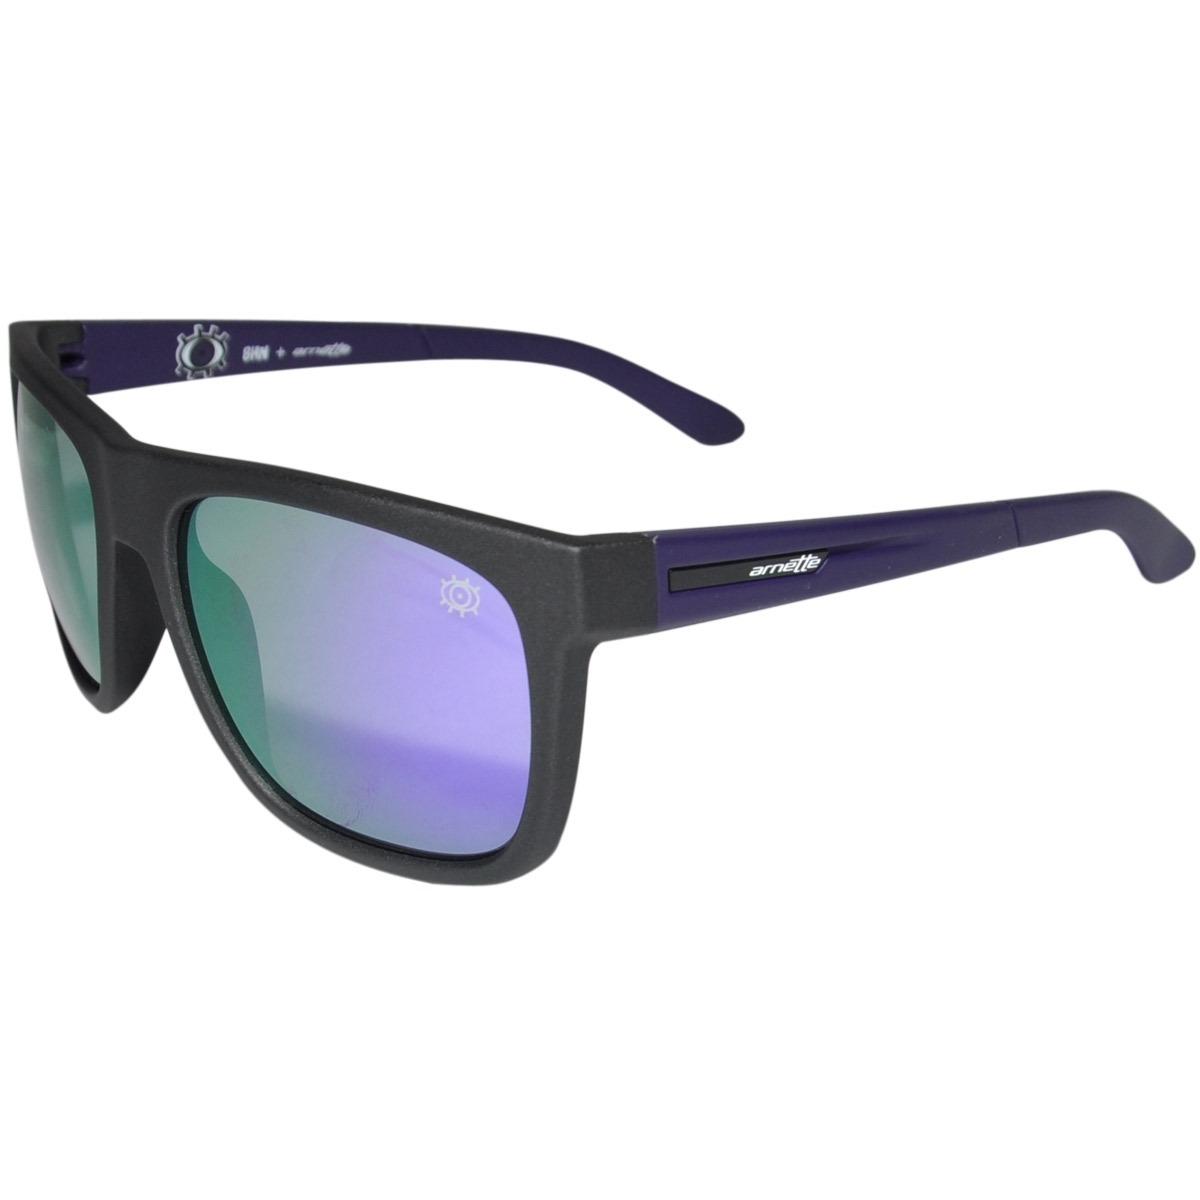 Óculos Arnette Fire Drill - Cut Wave - R  199,00 em Mercado Livre 8677a82f13